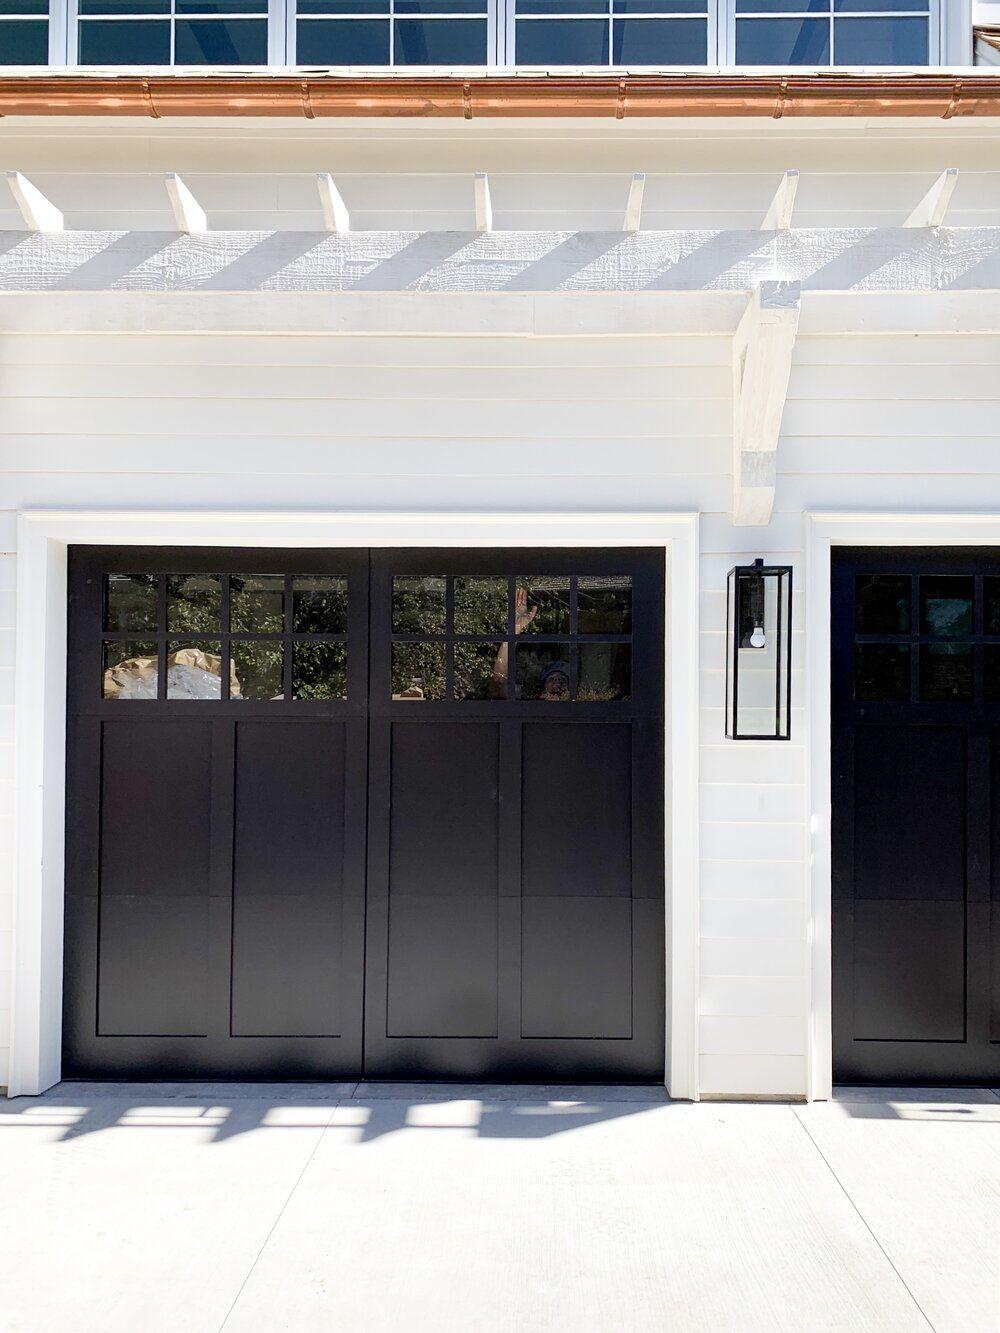 Transitional Timeless Home Exterior Inspiration Garage Door